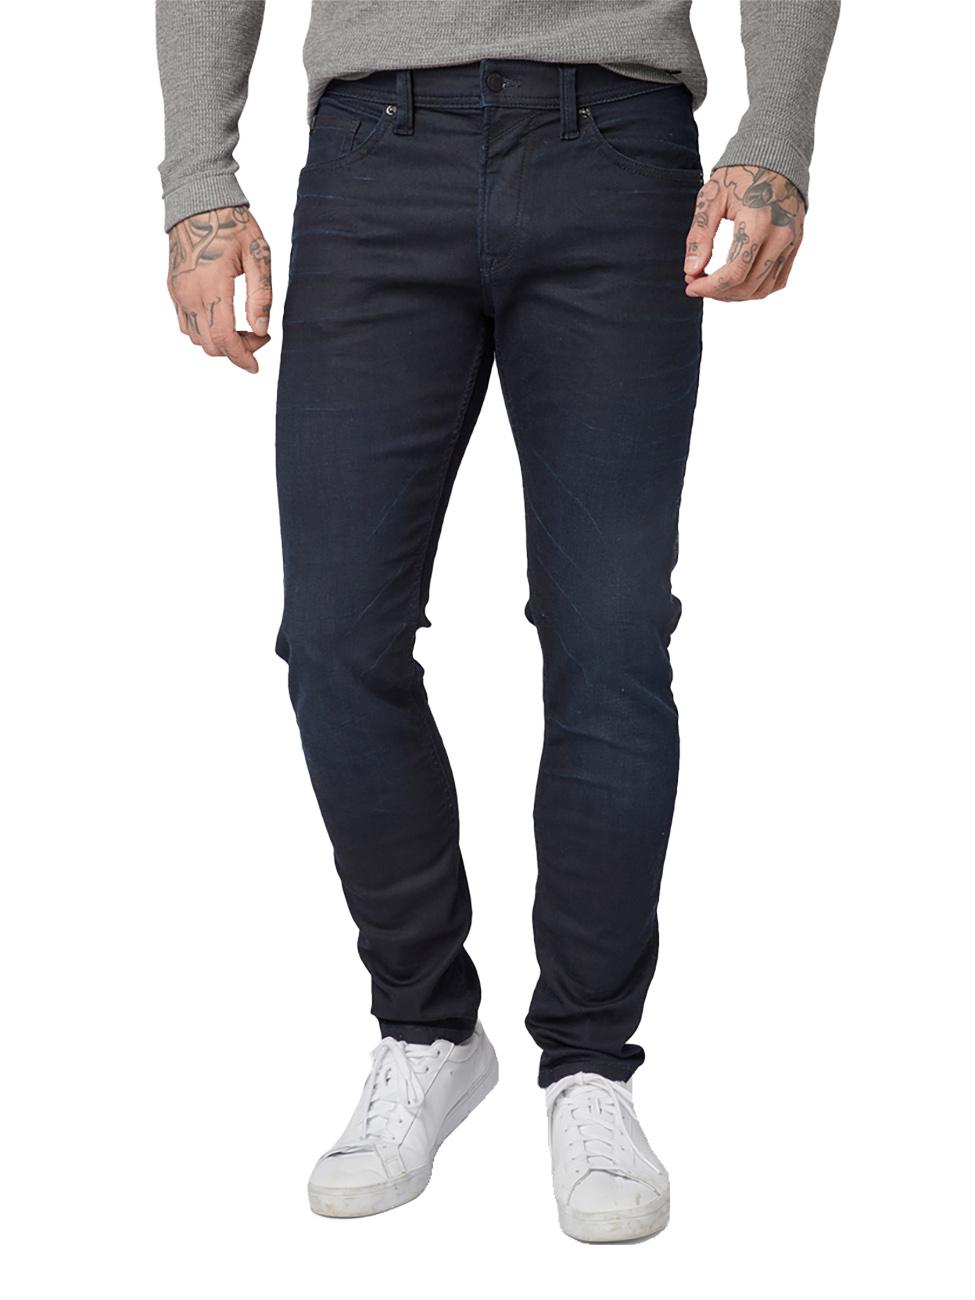 price reduced size 40 fashion styles Tom Tailor Denim Herren Jeans Piers - Super Slim Fit - Blau - Blue Black  Denim